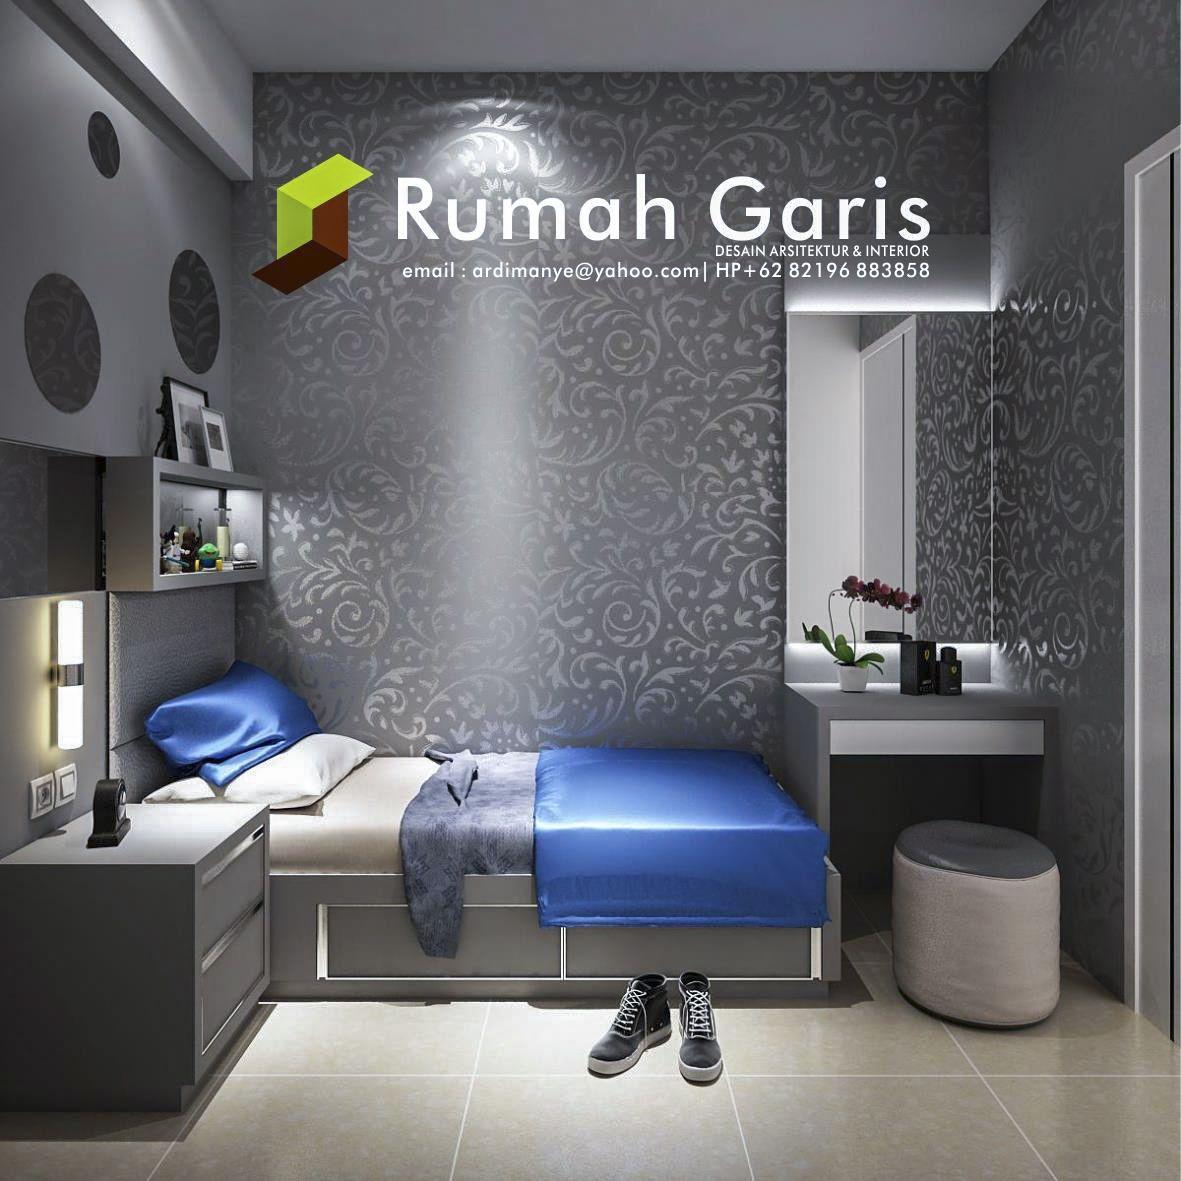 Desain interior kamar anak apartemen small konsep klasik modern minimalis master bedroom also rh in pinterest